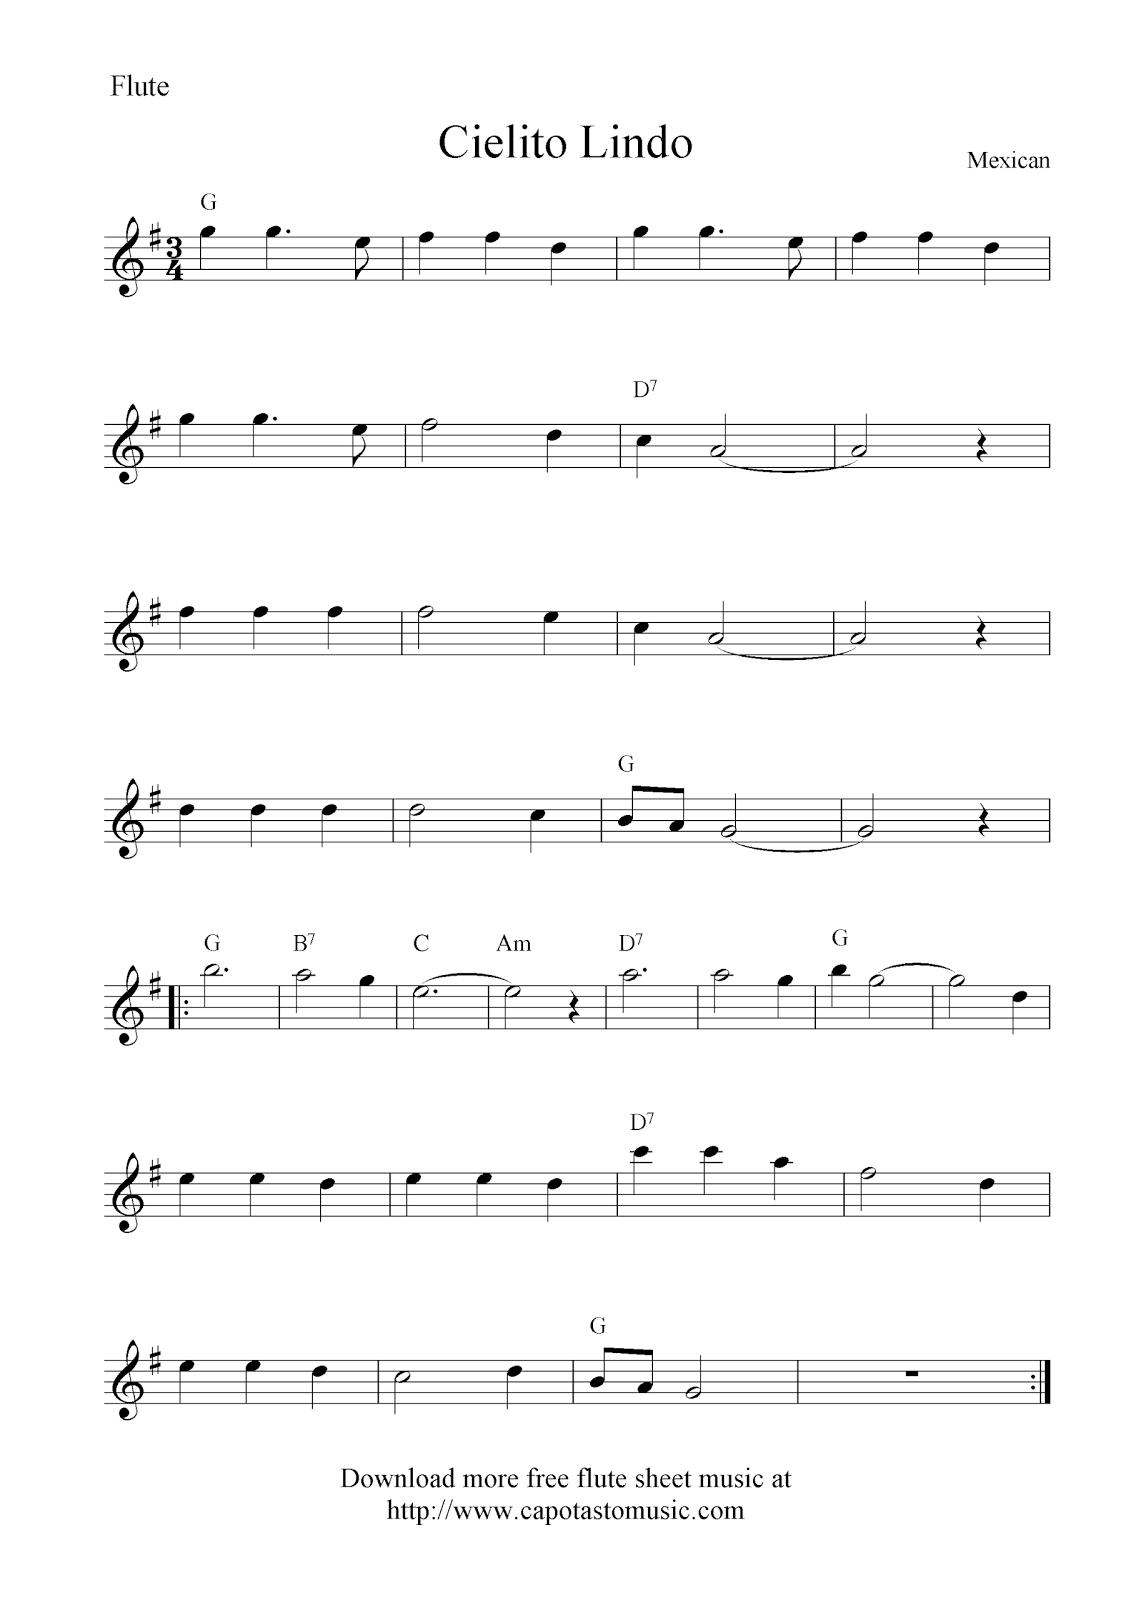 Free Sheet Music Scores: Cielito Lindo, free flute sheet music notes